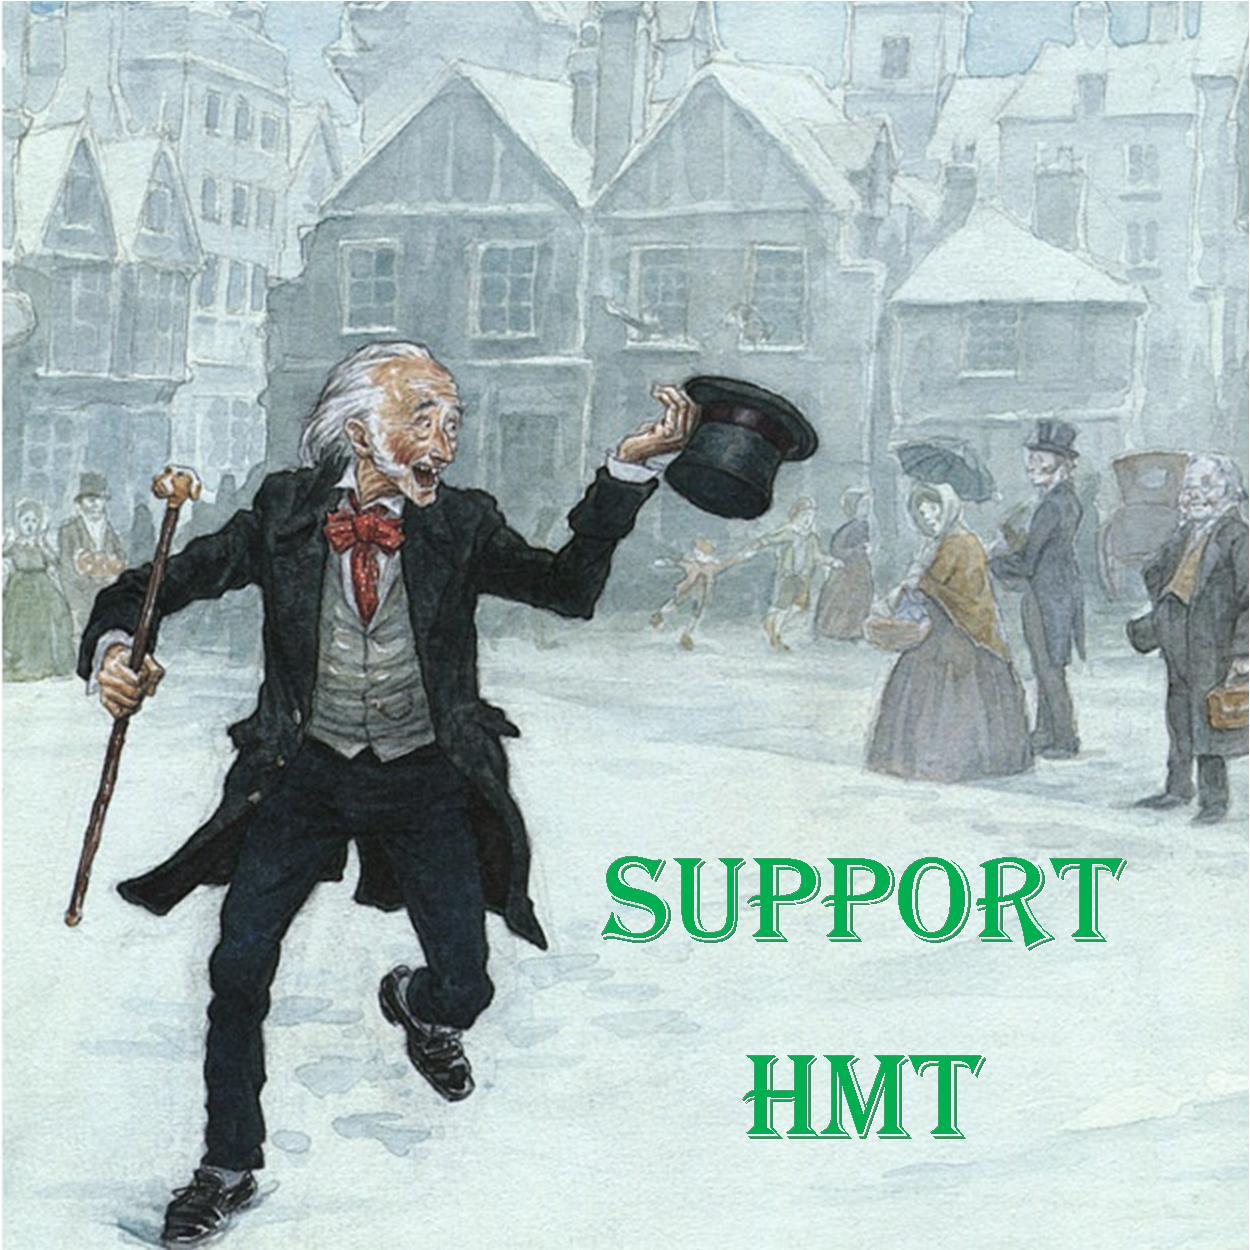 Support HMT's mid-season appeal